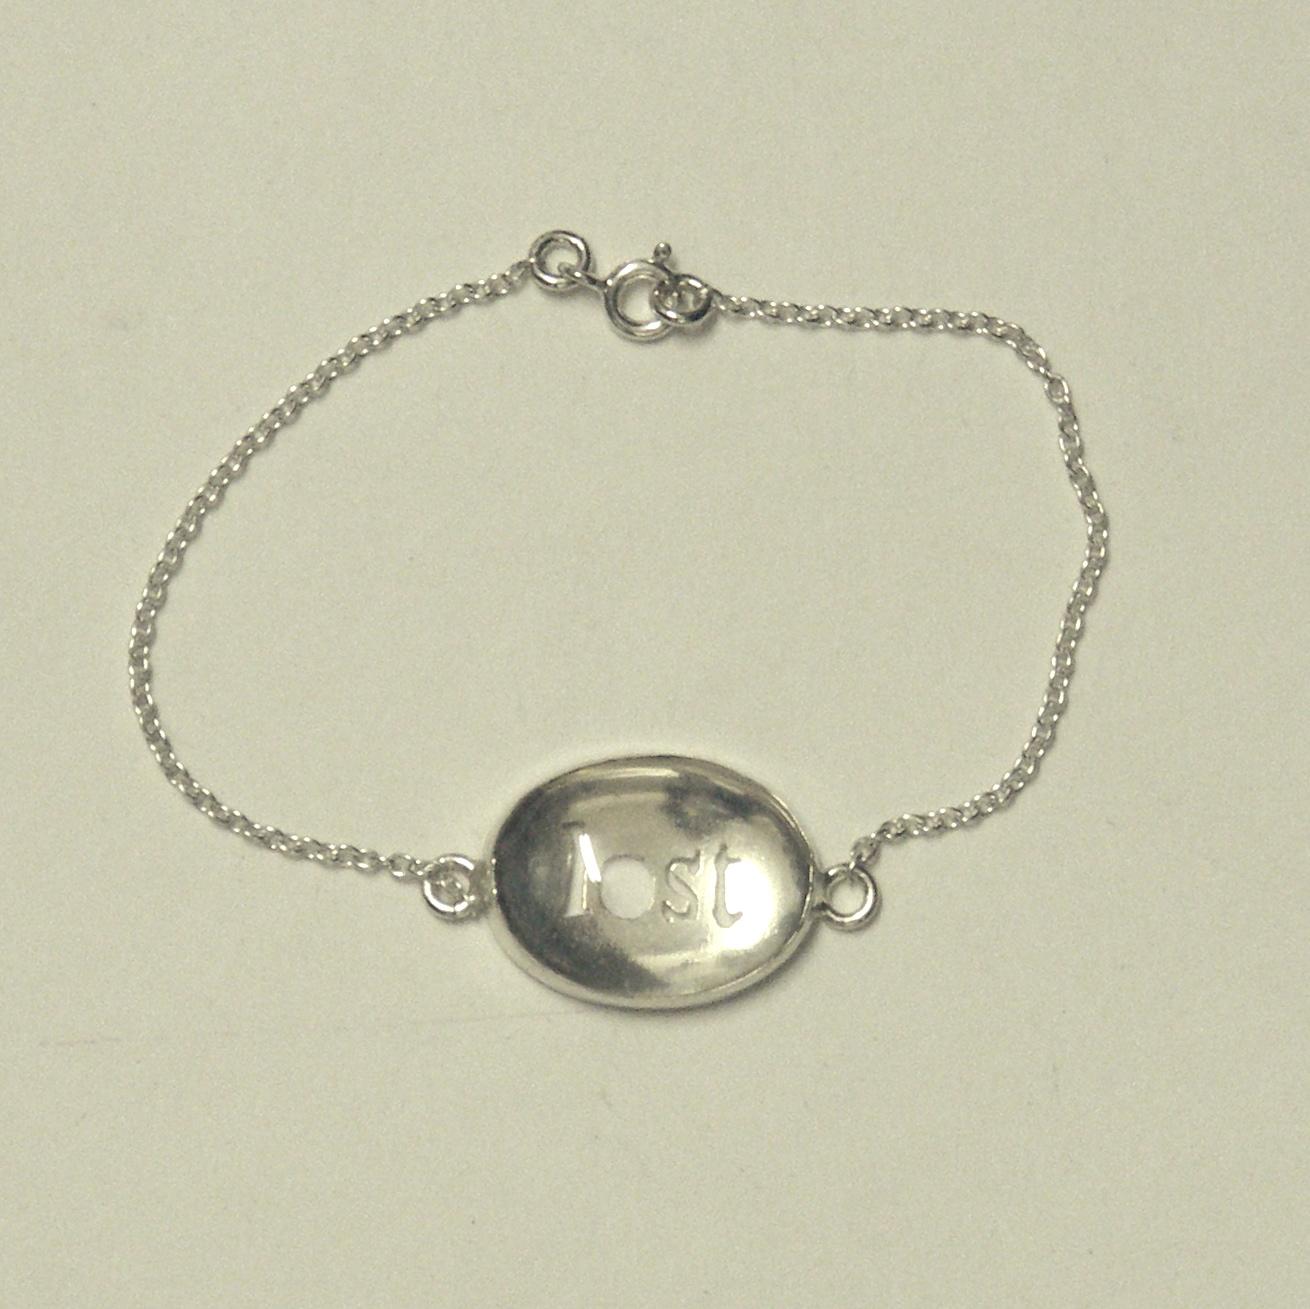 LSB-Lost setting bracelet